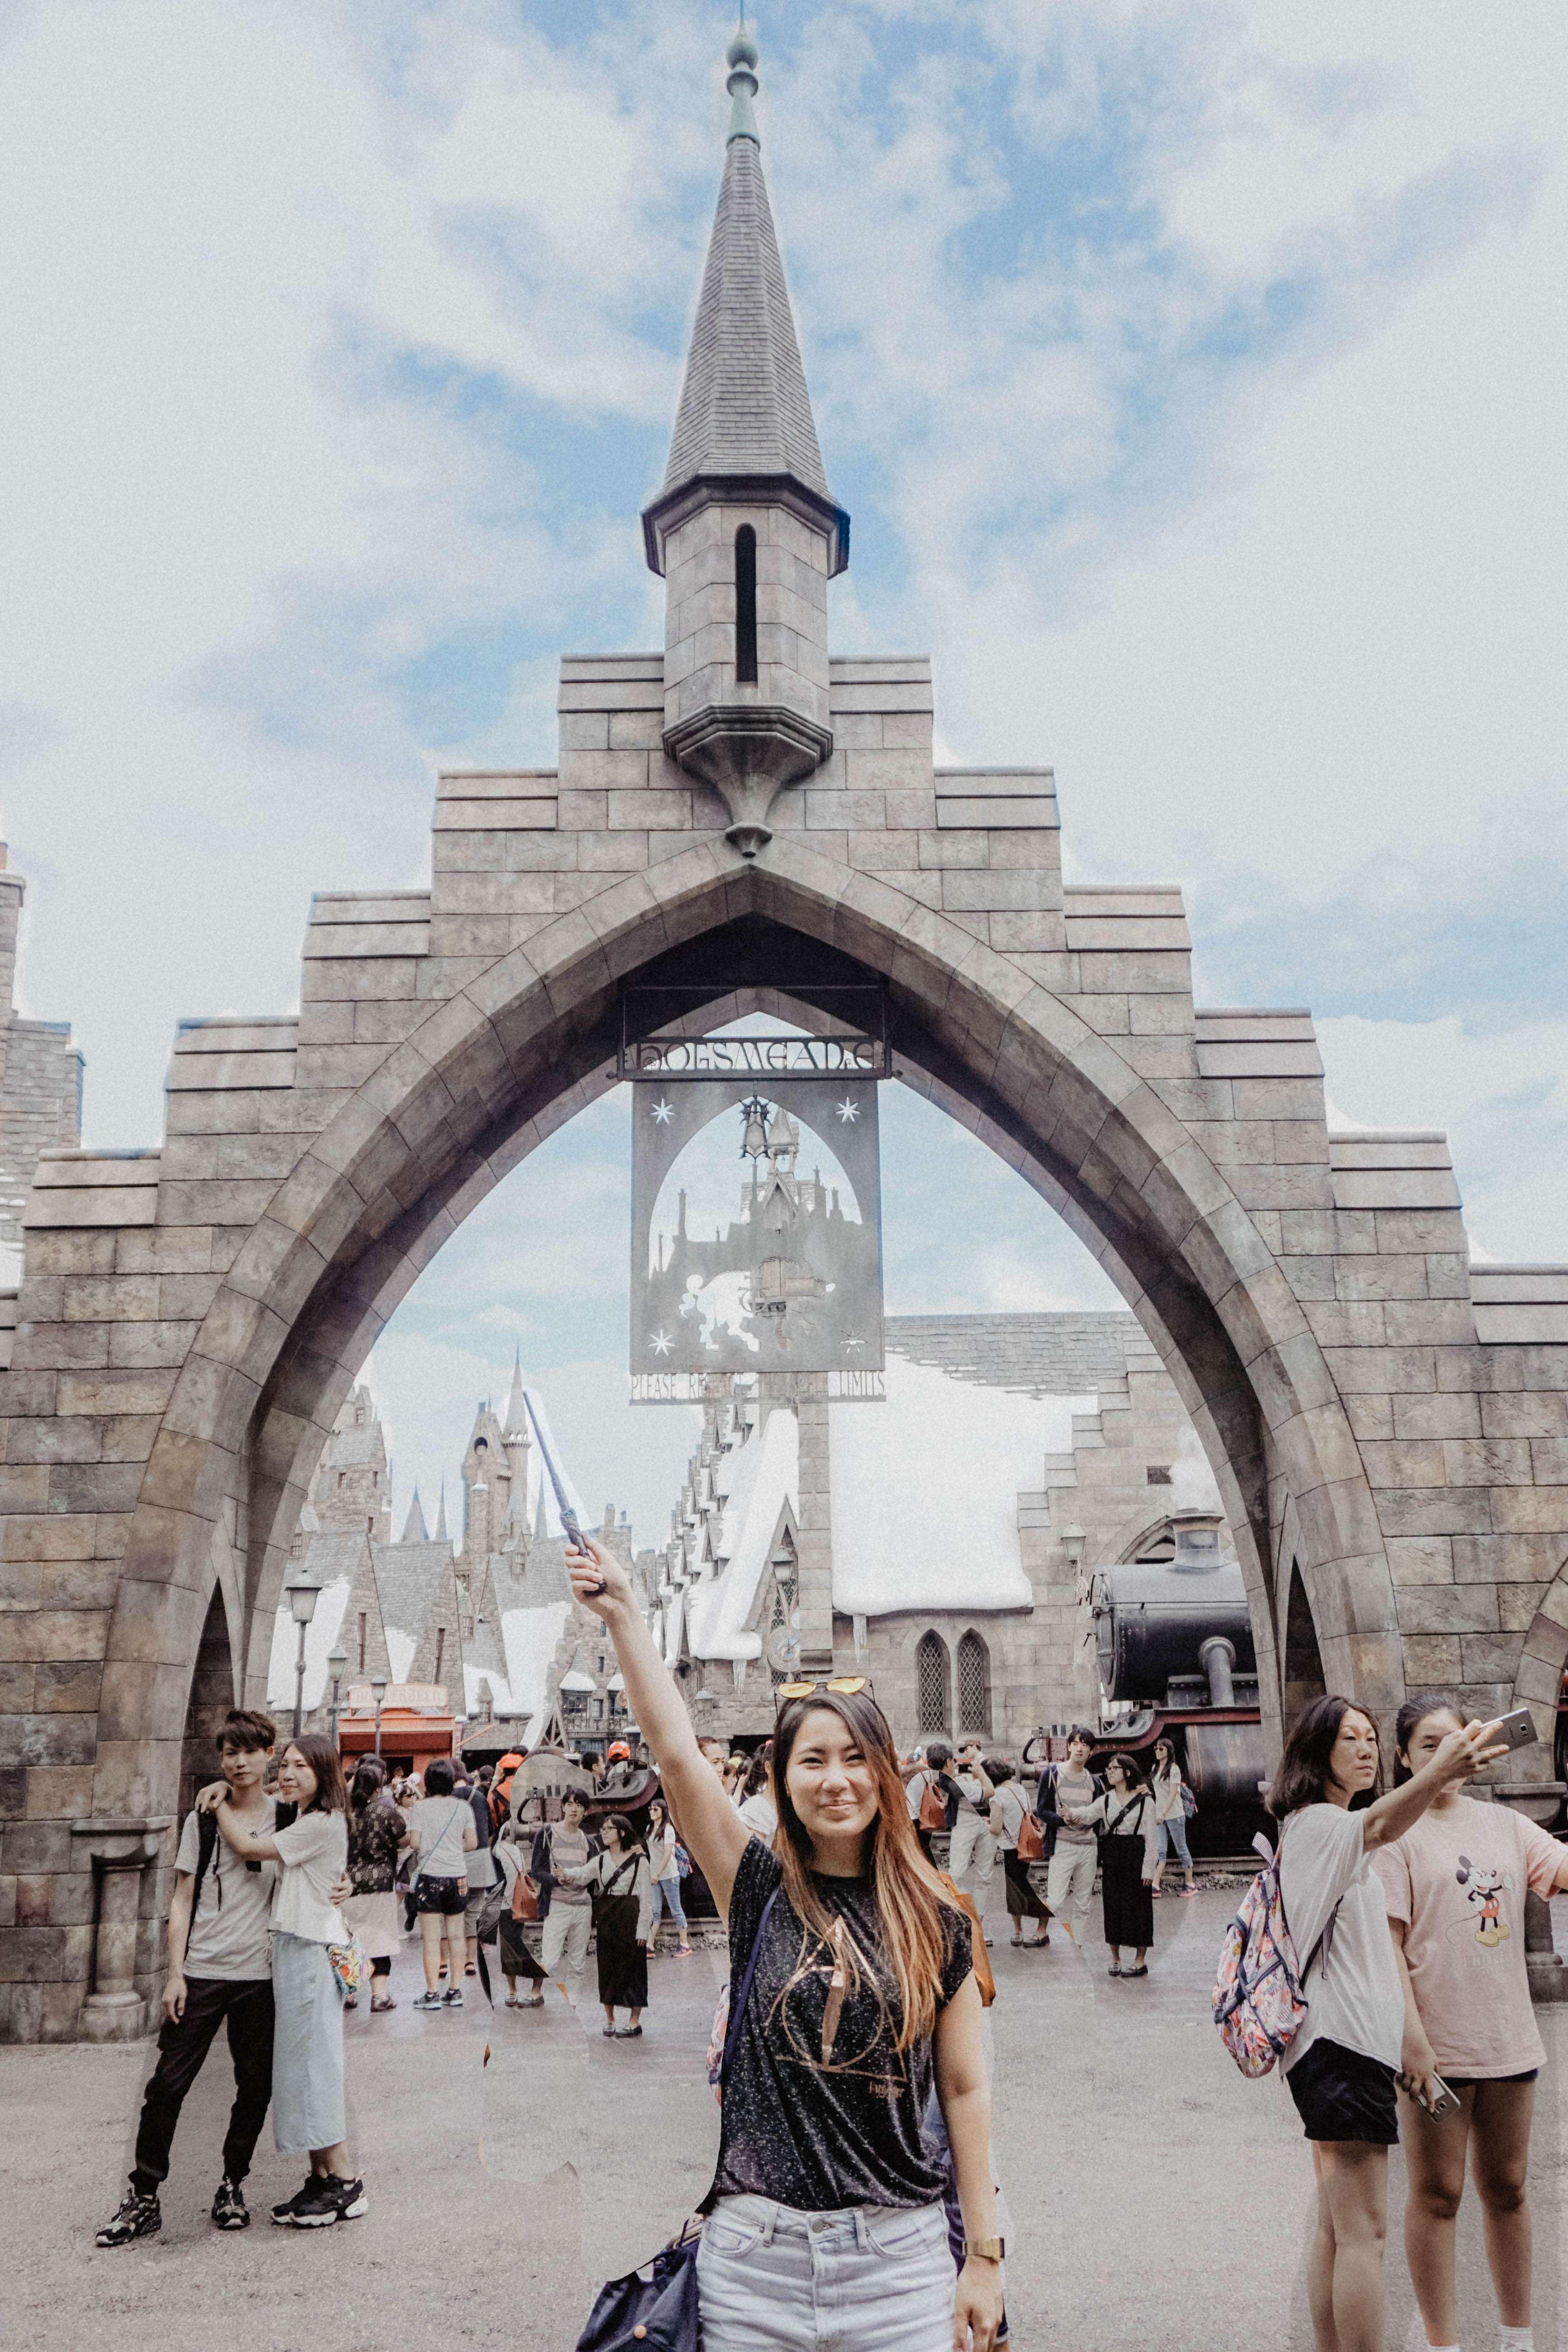 Wizarding World of Harry Potter - Hogsmeade